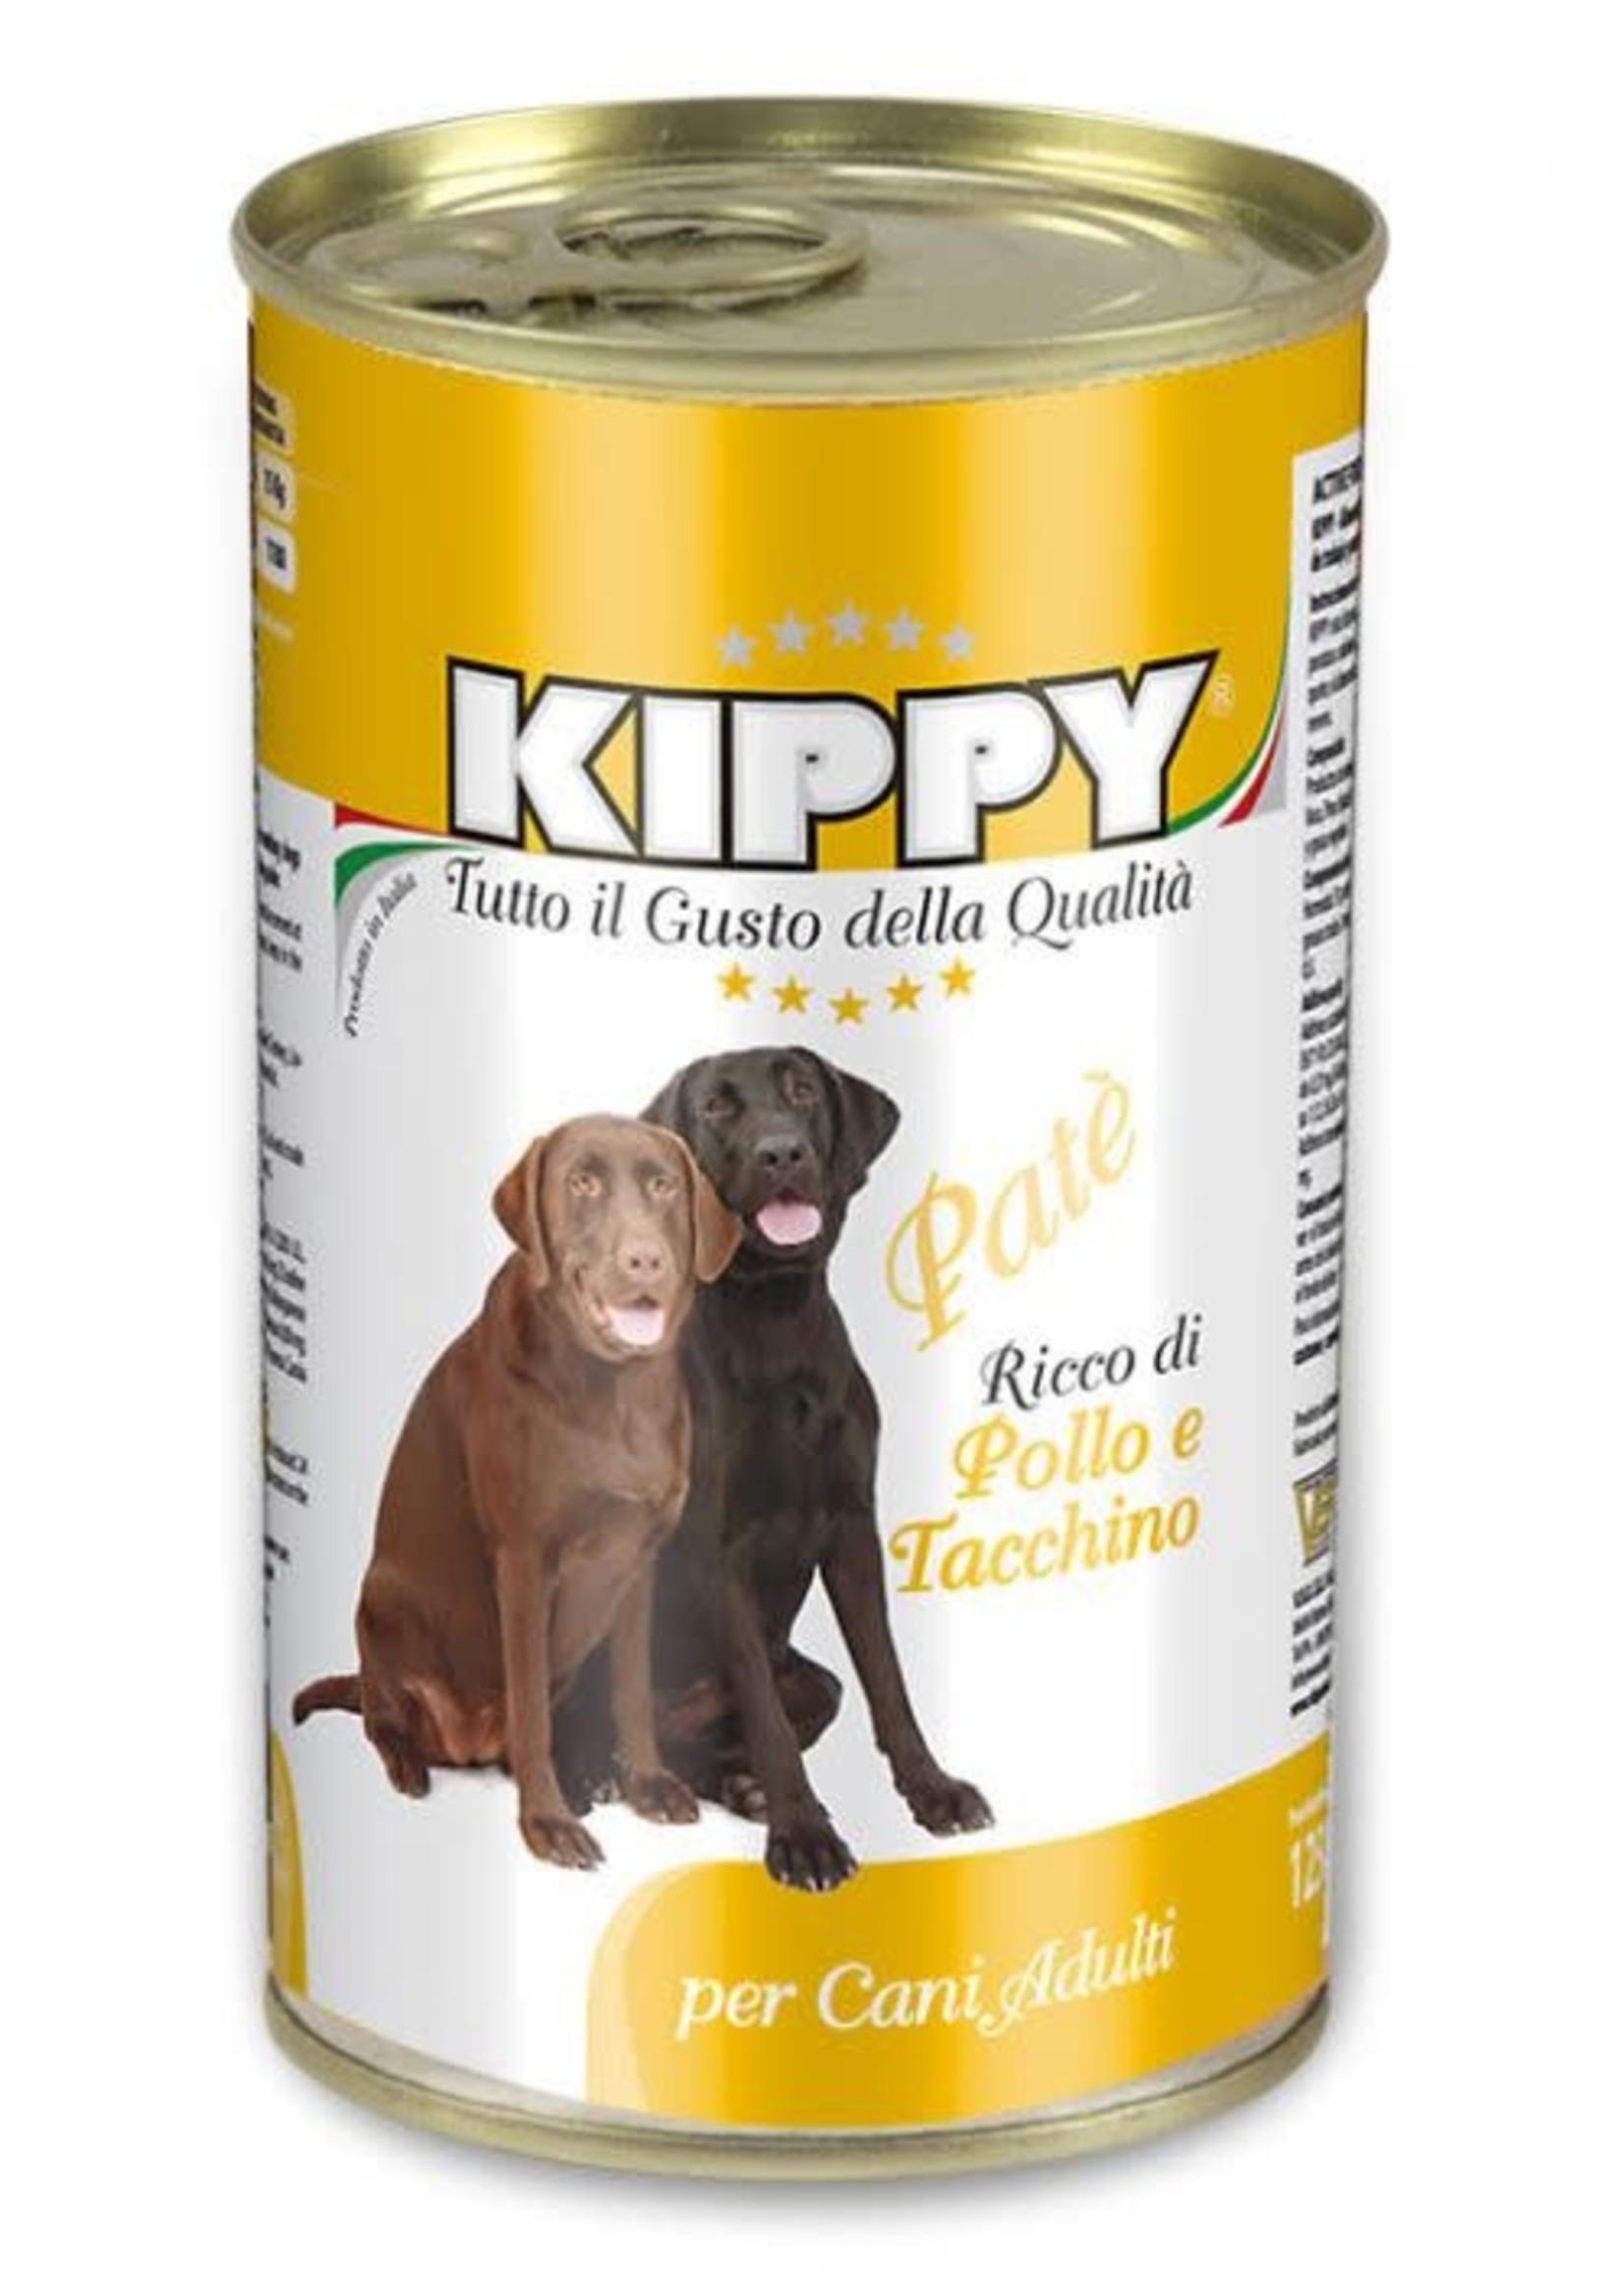 Kippy® Kippy Chicken & Turkey Pâté 14oz